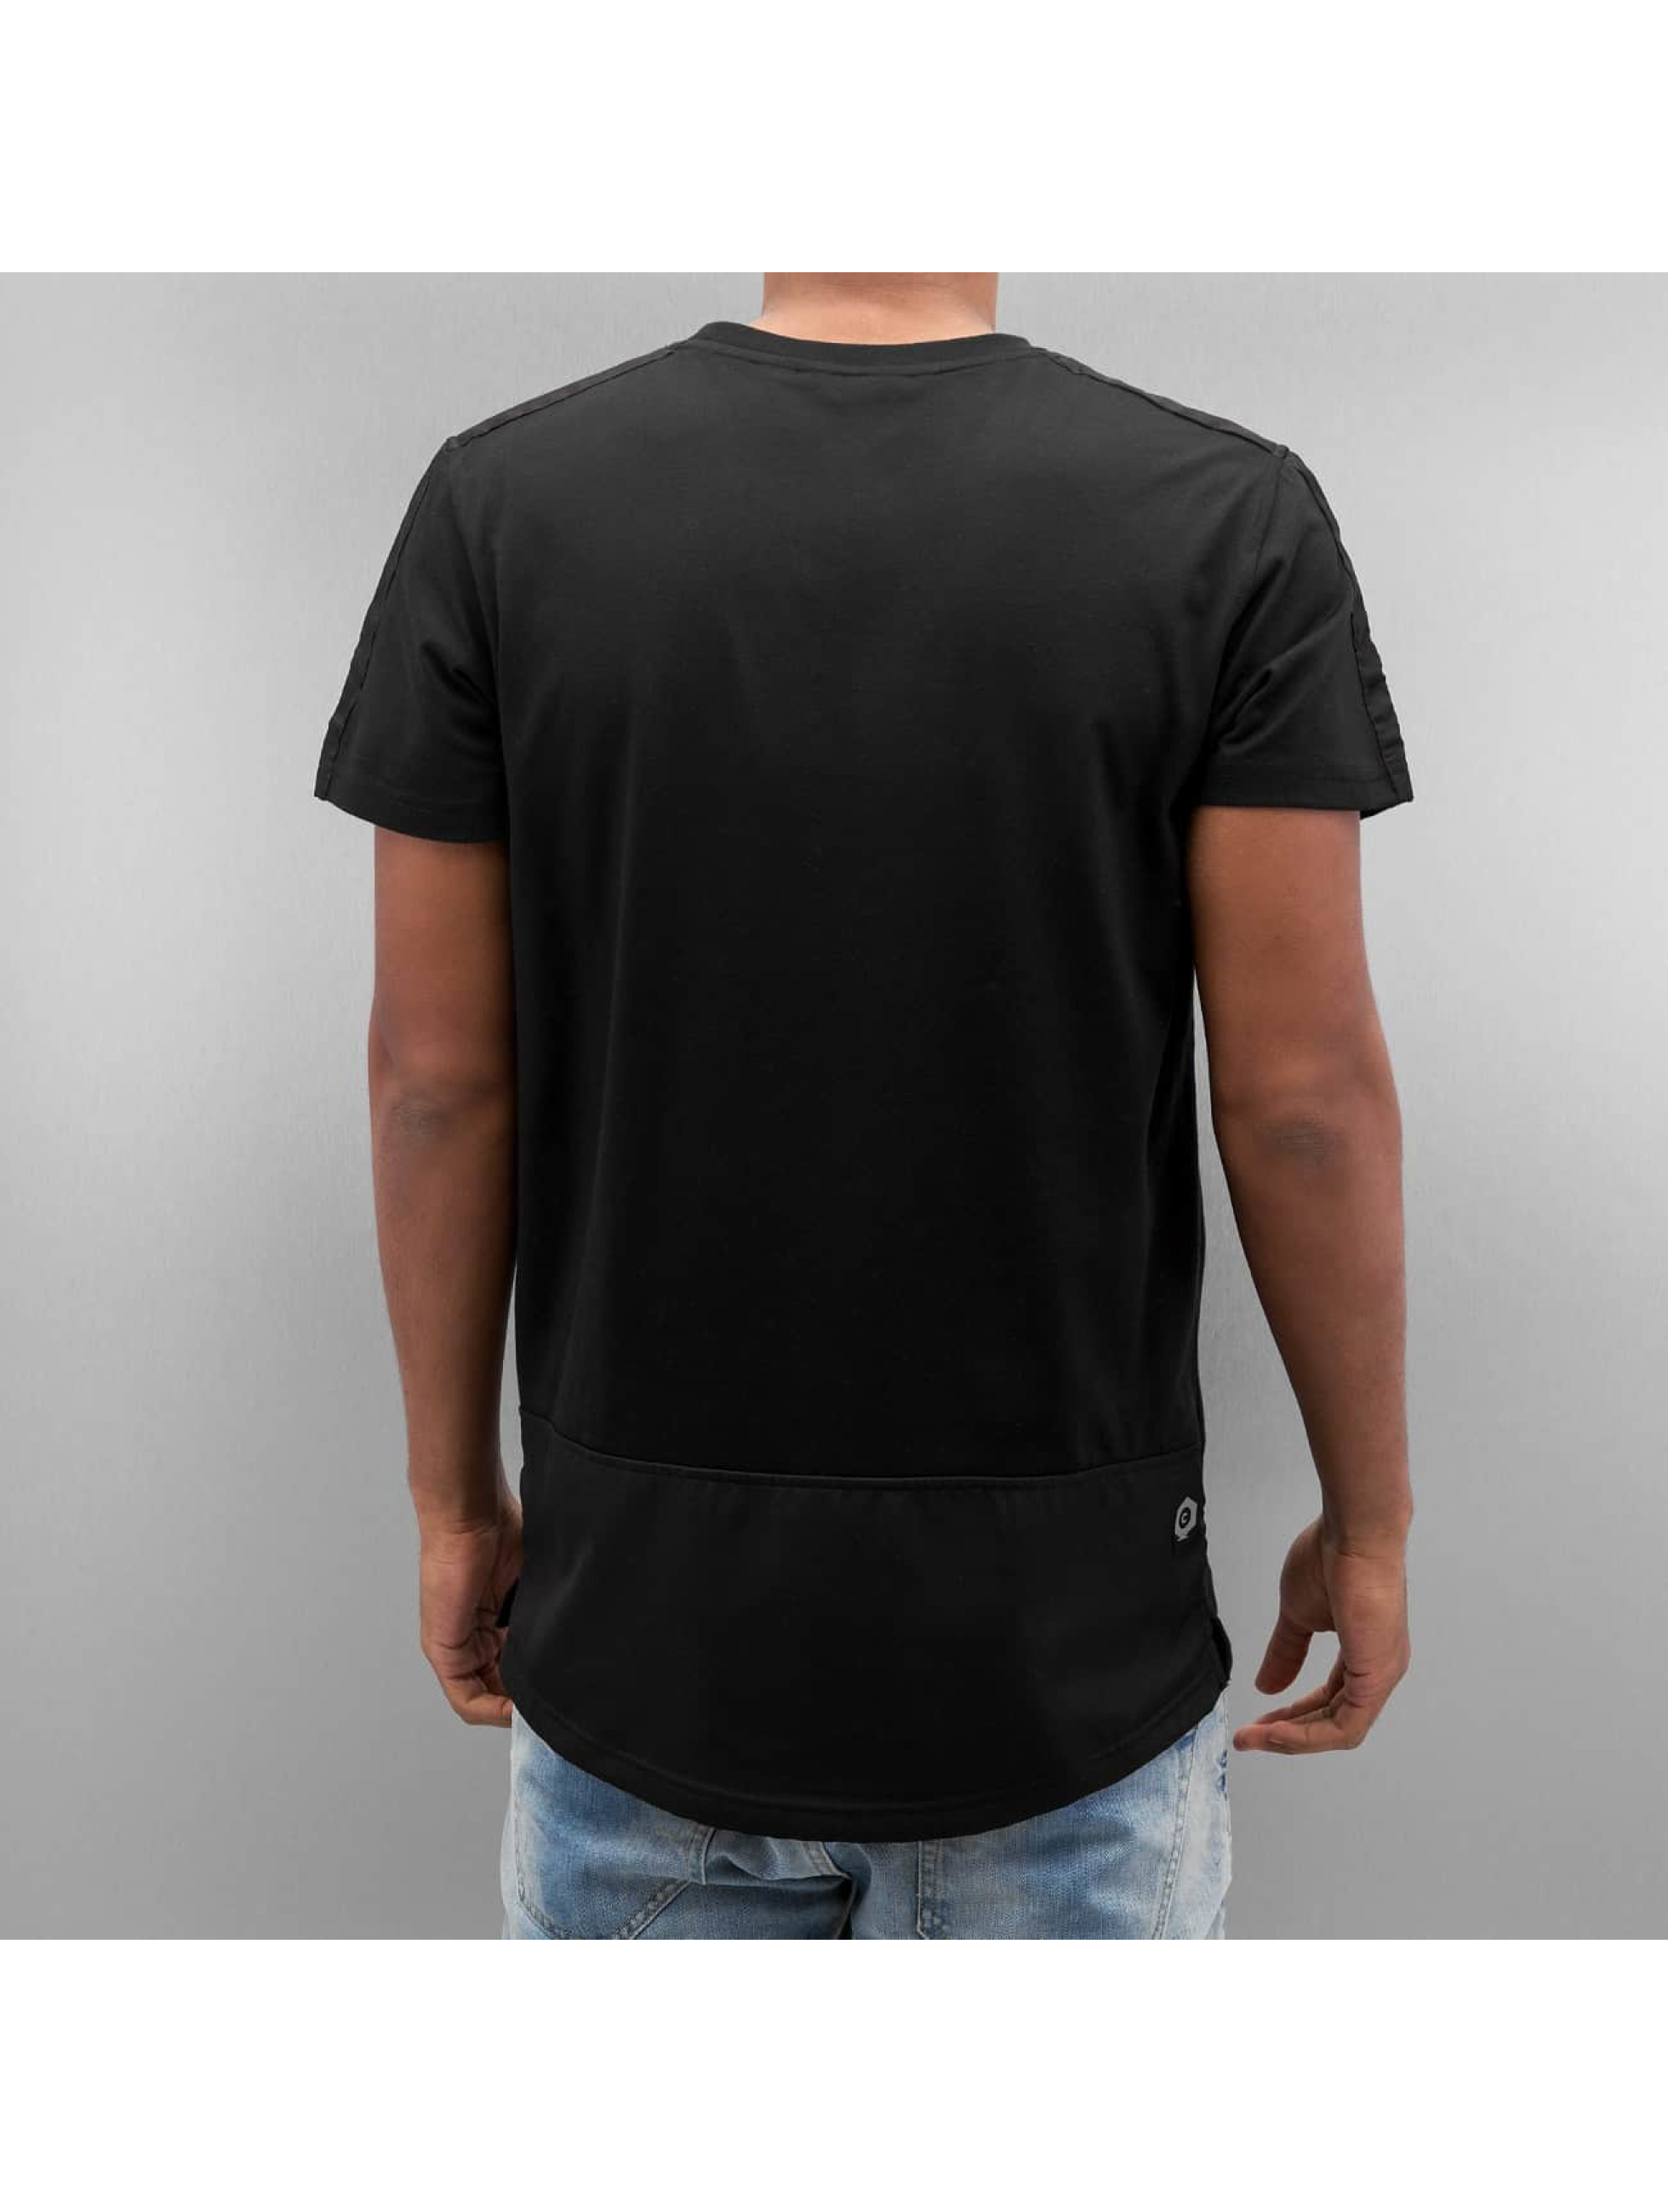 Jack & Jones t-shirt jjcoBlackfriars zwart